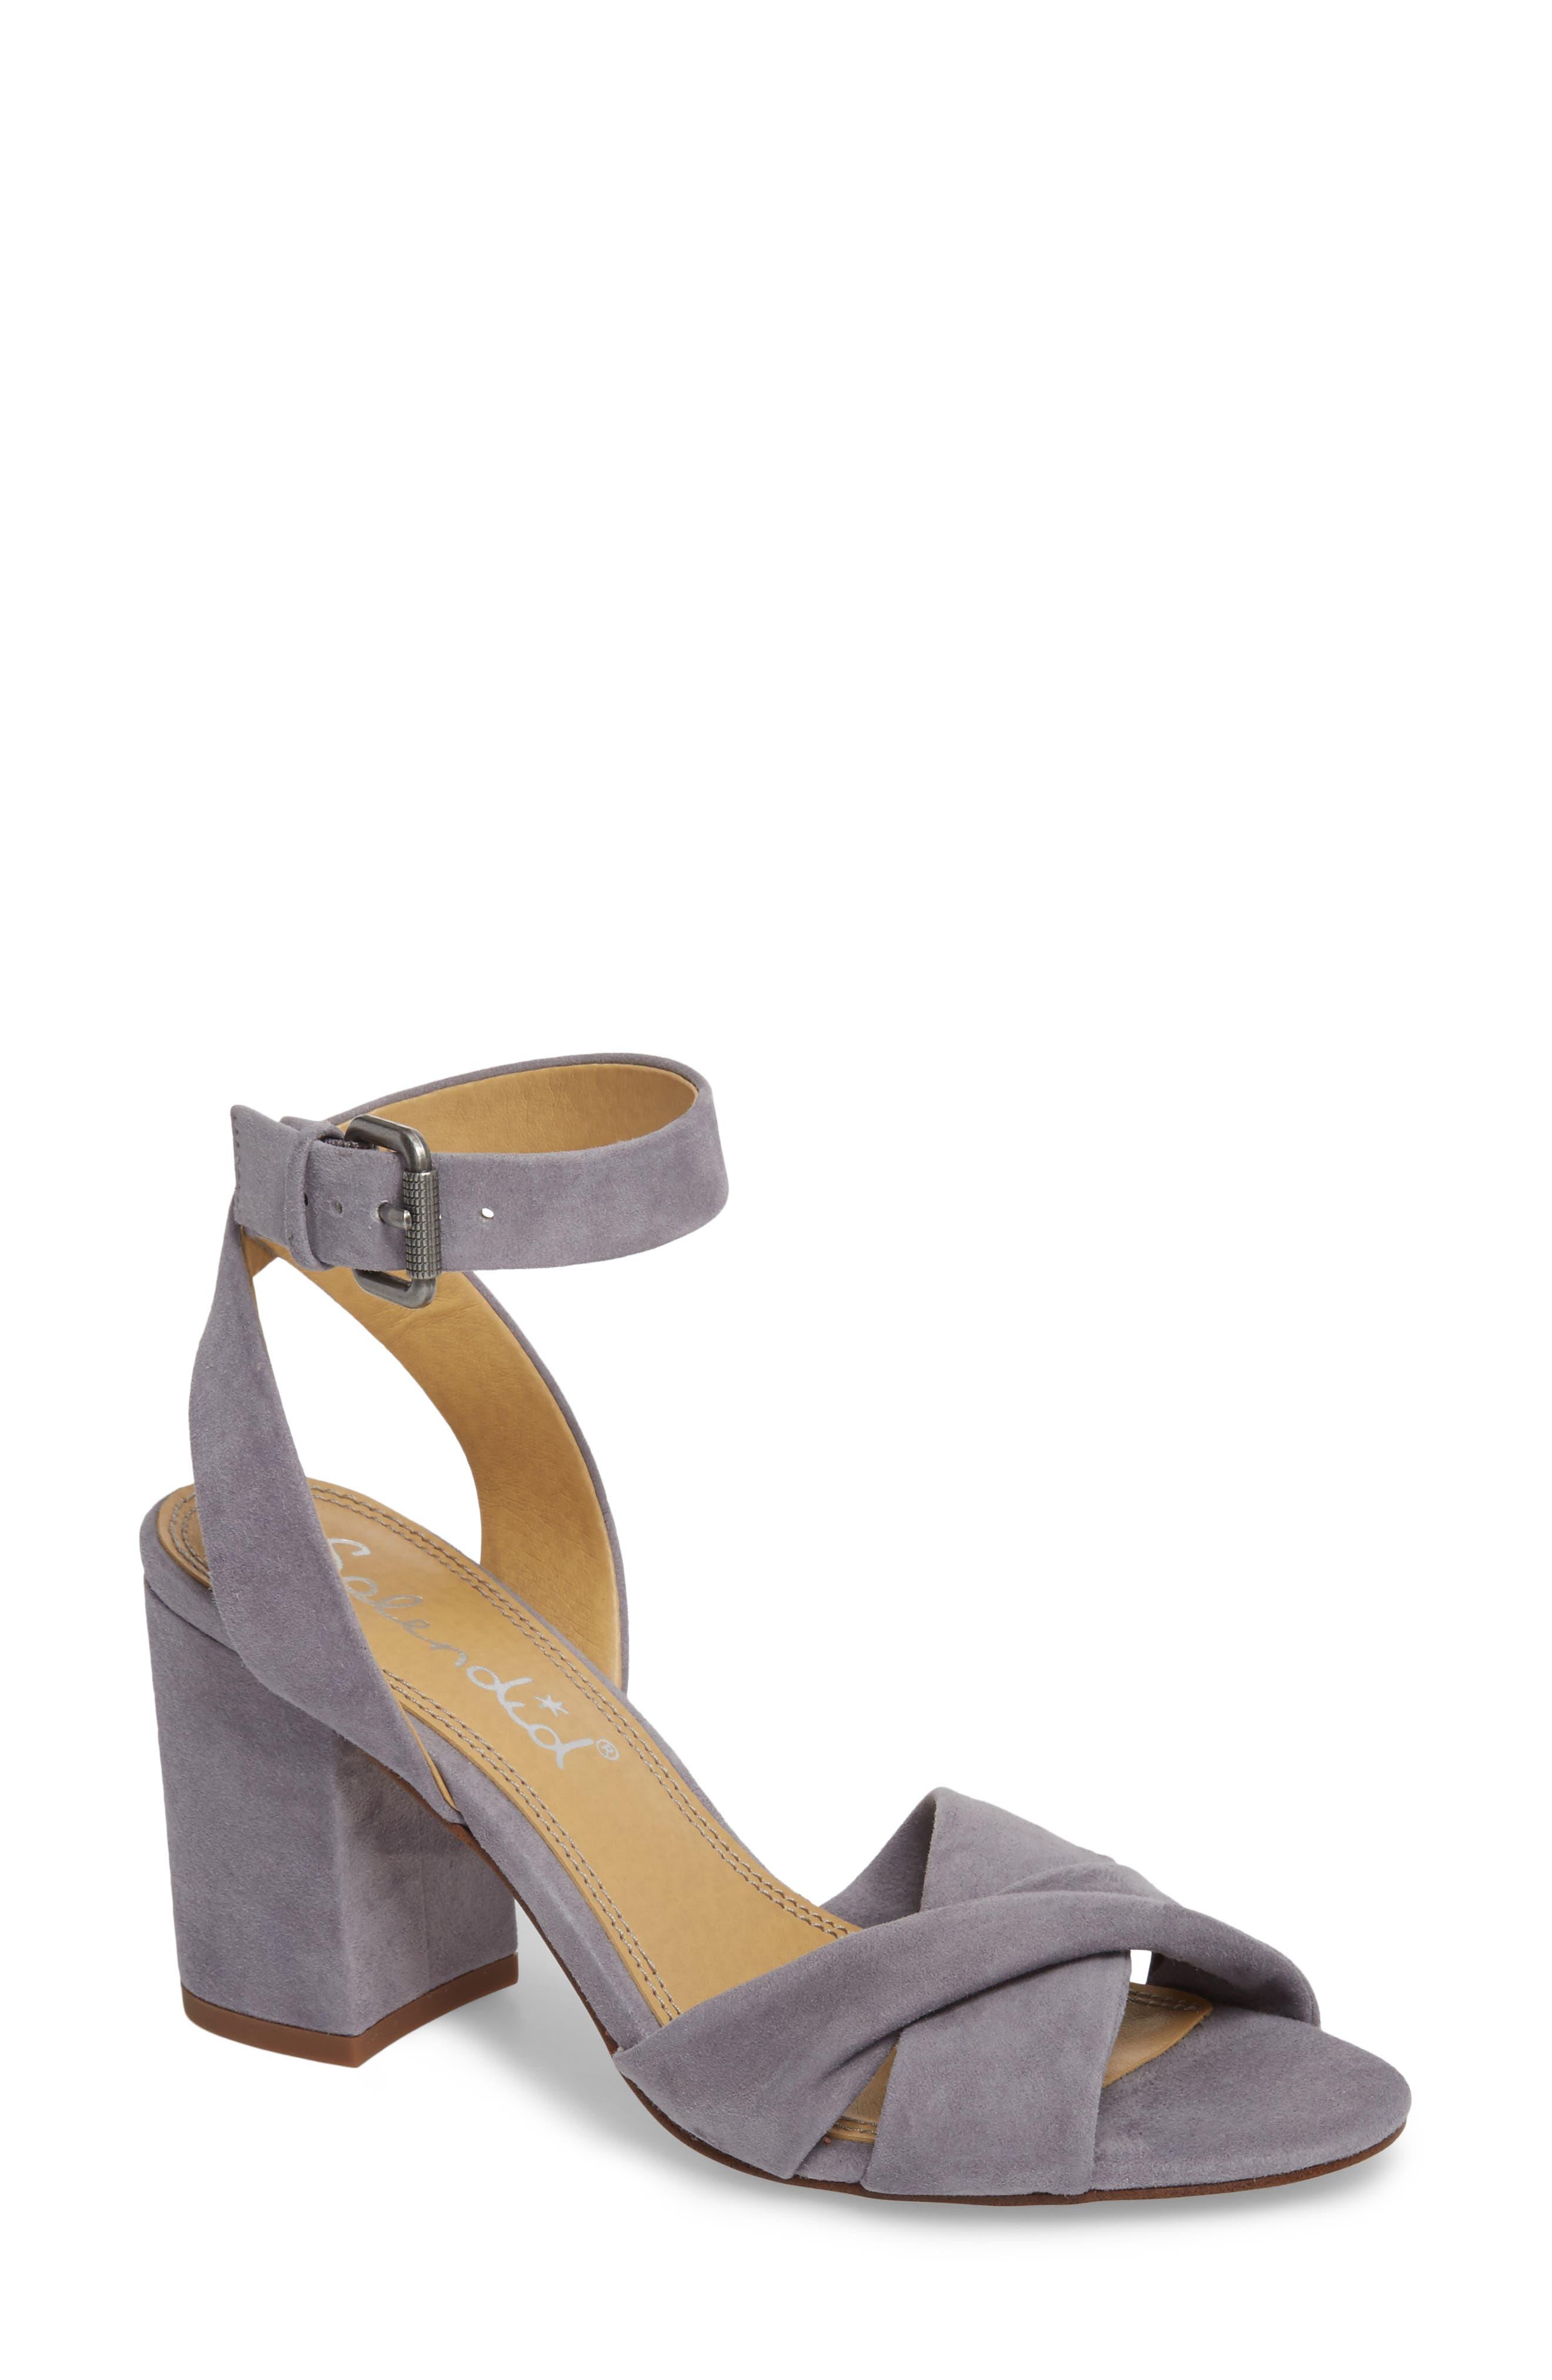 Fairy Block Heel Sandal,                             Main thumbnail 1, color,                             STEEL GREY SUEDE